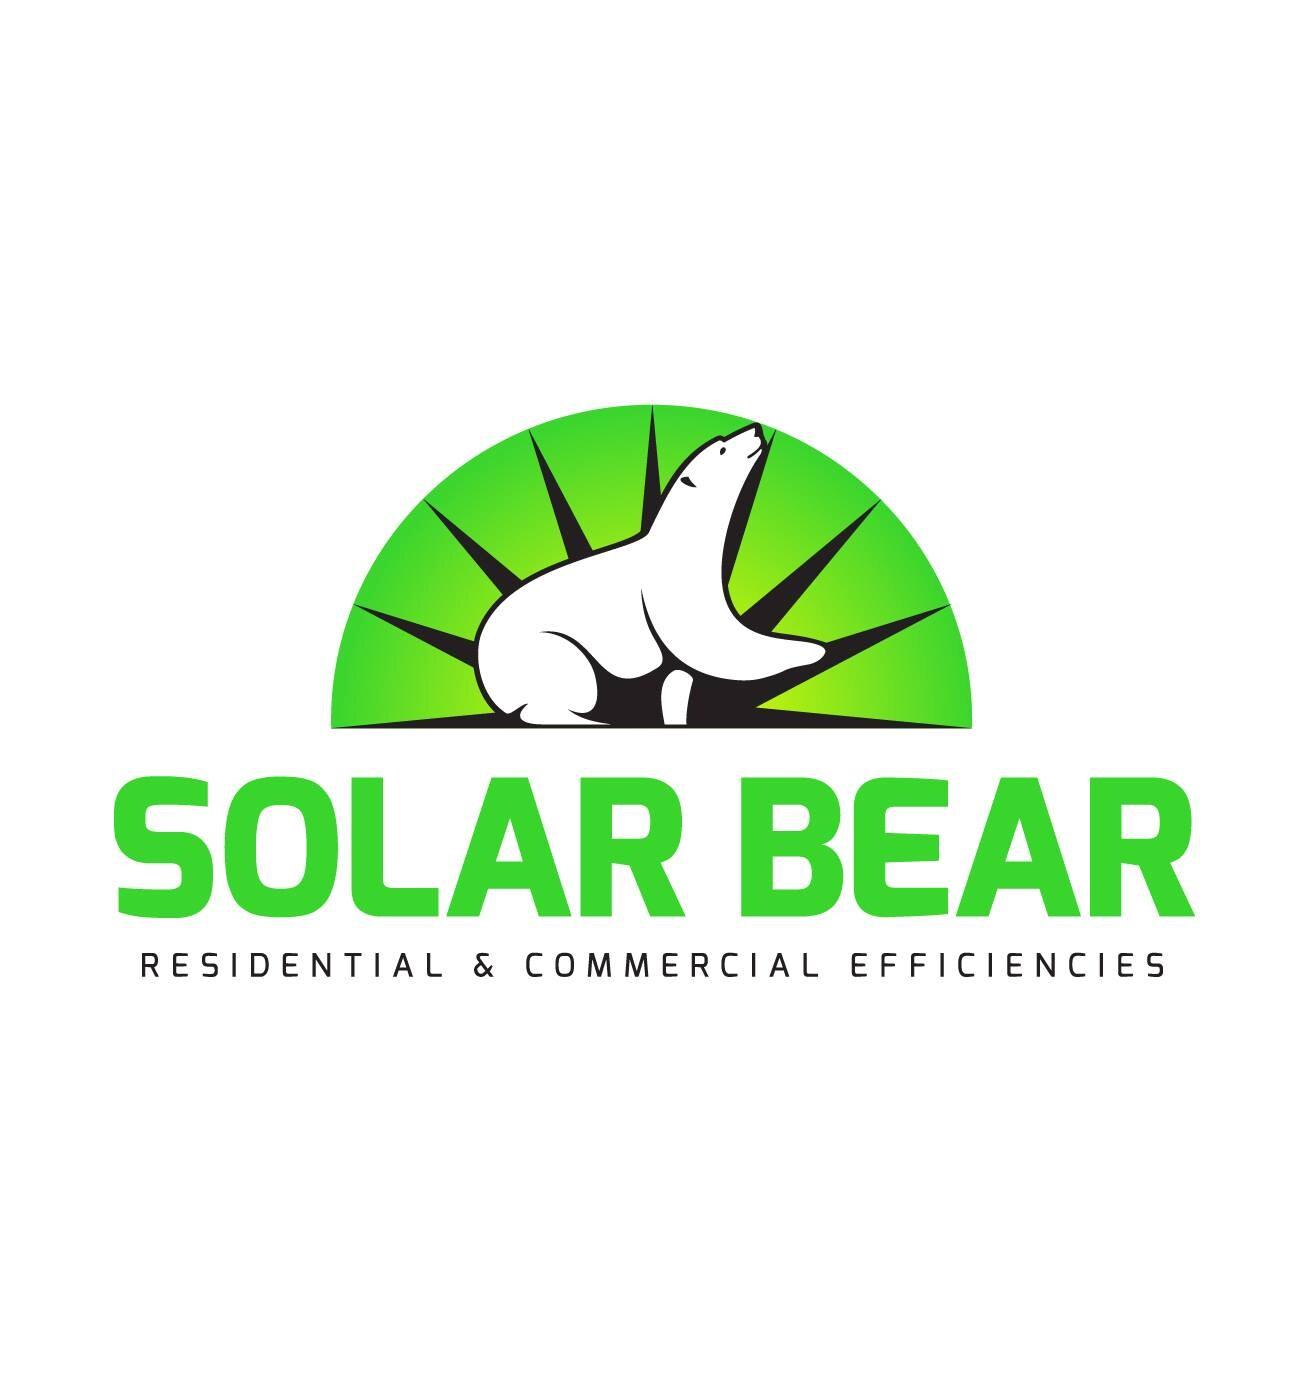 Solar Bear Residential & Commercial Efficiencies